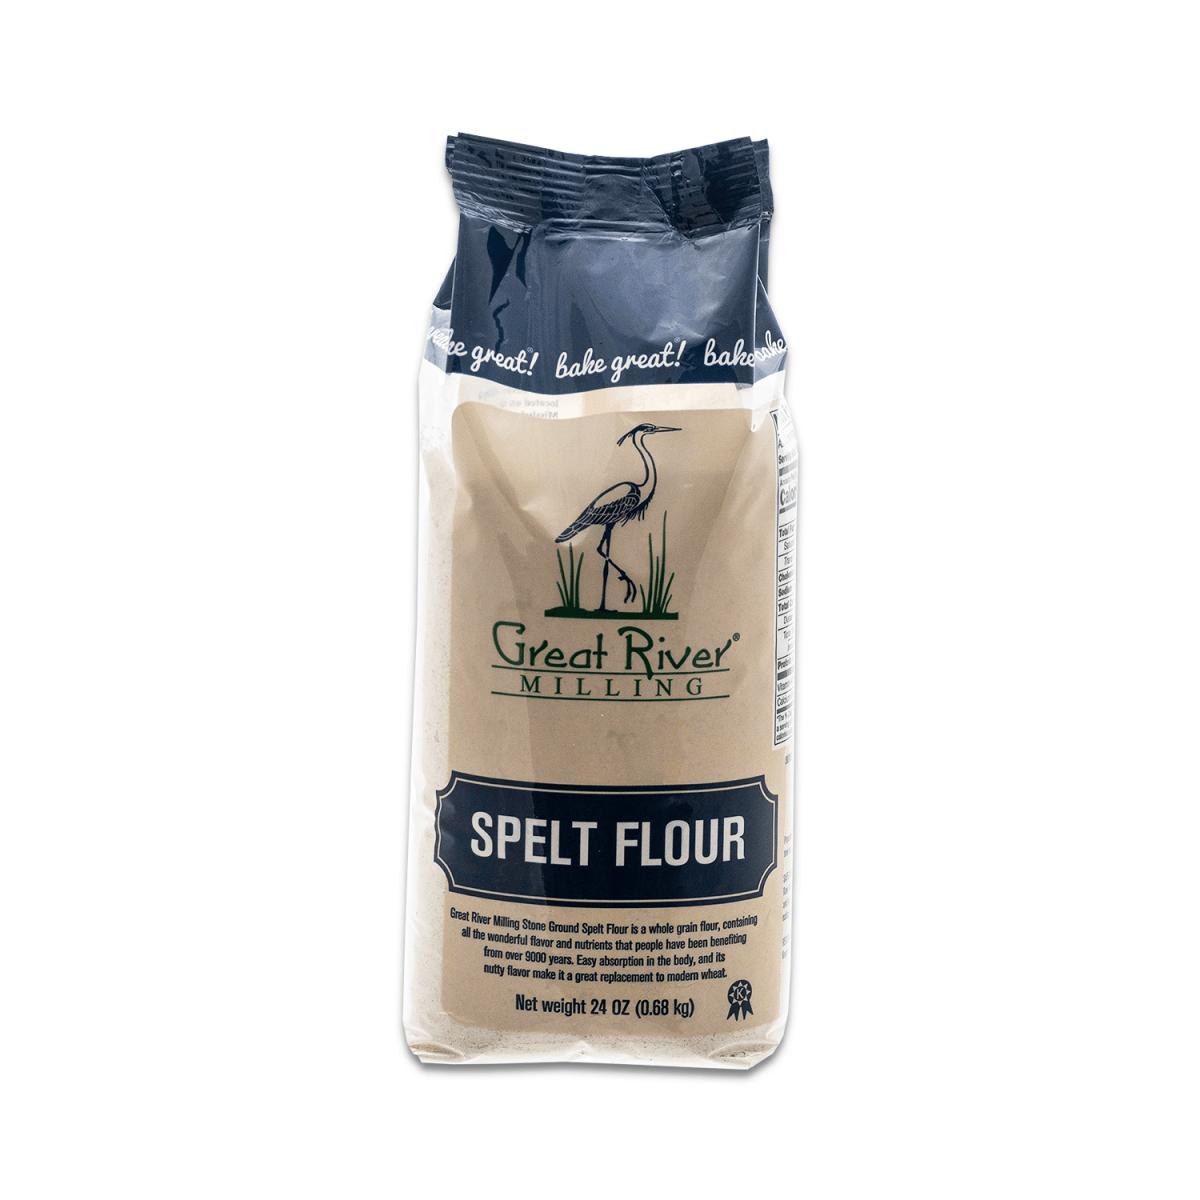 Great River Milling Spelt Flour Front